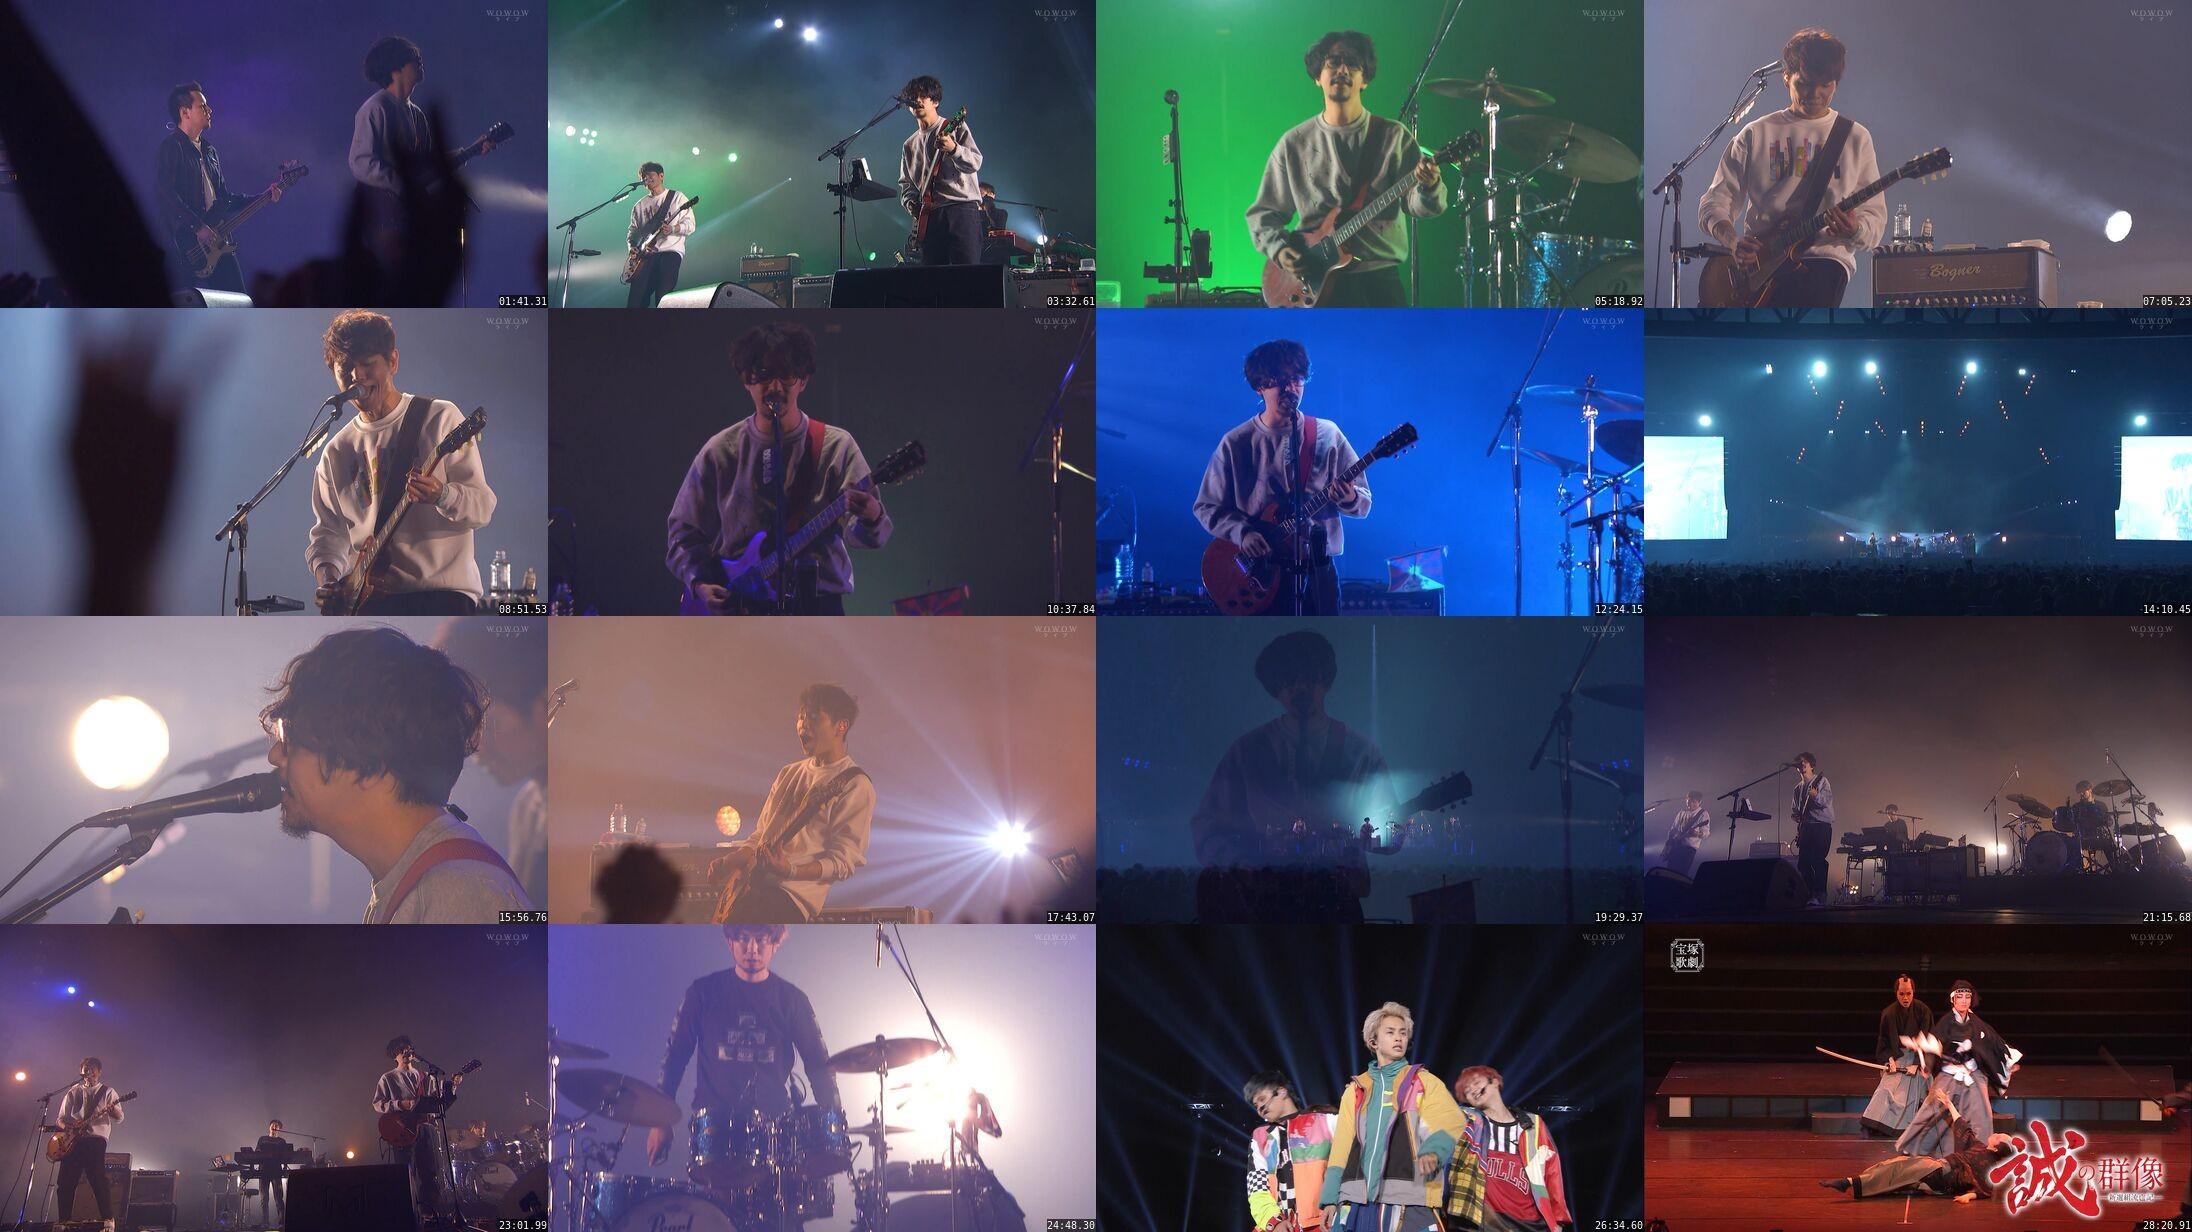 ASIAN KUNG-FU GENERATION – COUNTDOWN JAPAN 19/20 Artist Special ASIAN KUNG-FU GENERATION (WOWOW Live 2020.07.24)